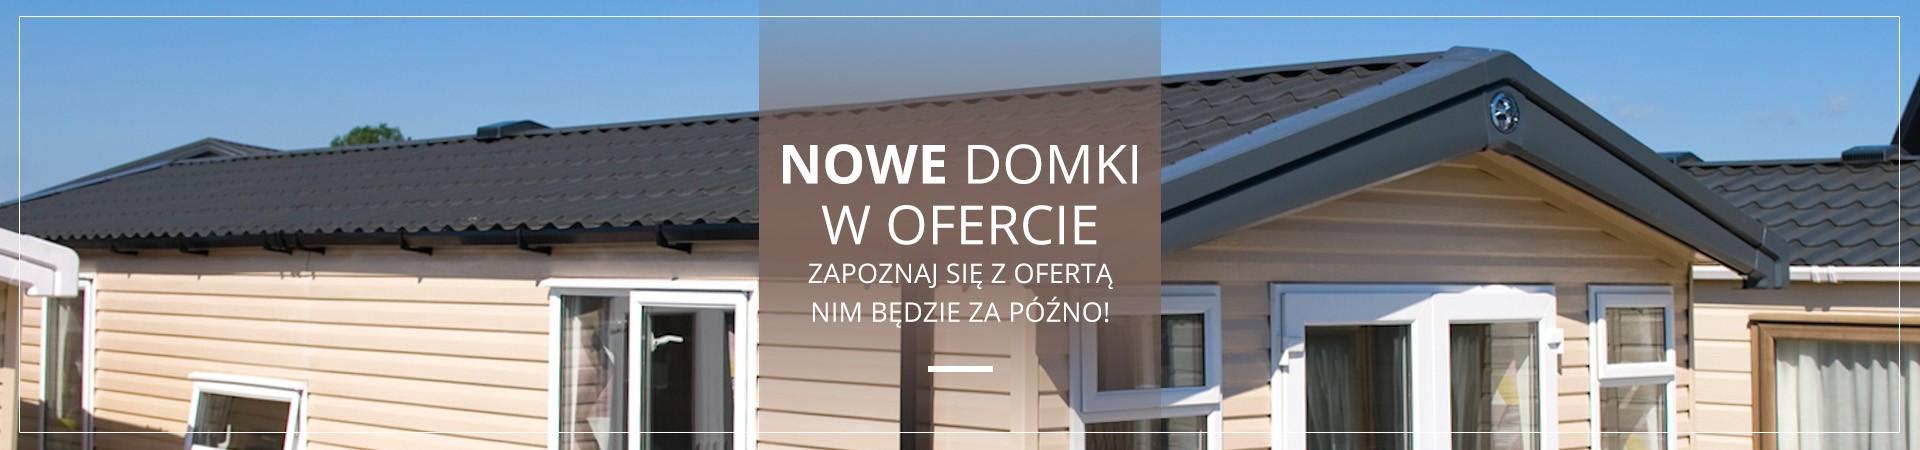 Nowe domki